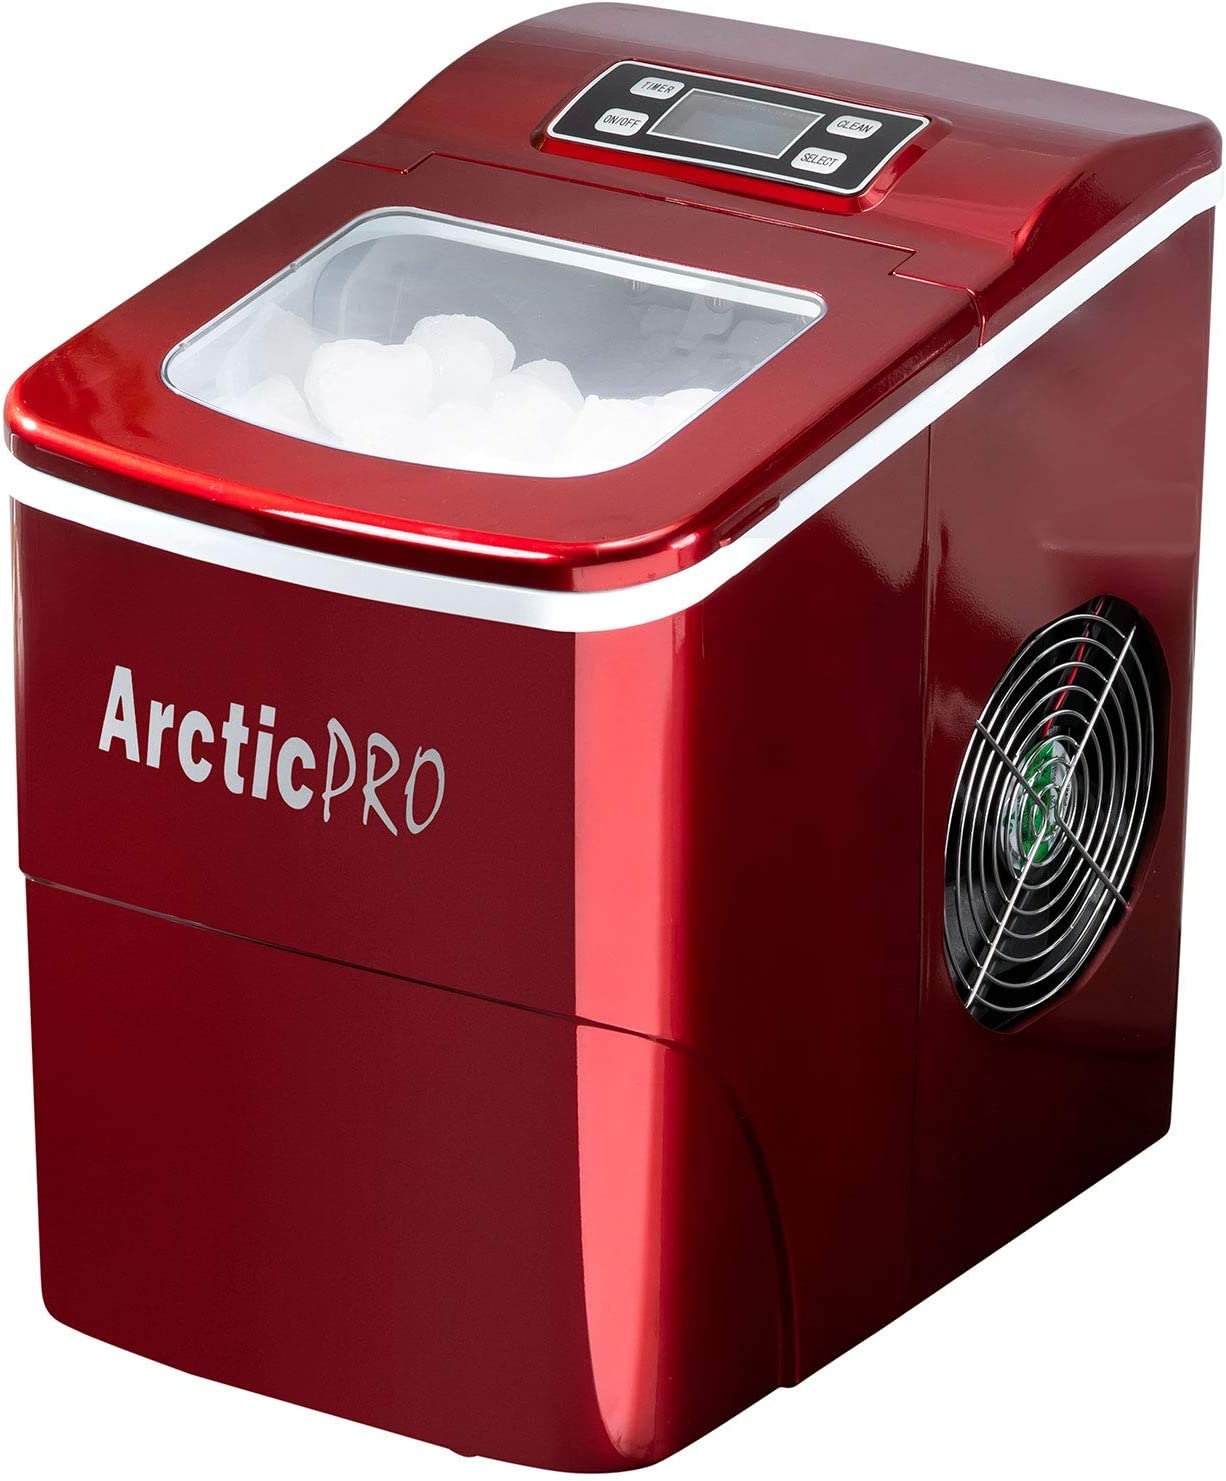 ghdonat.com Appliances Ice Makers Automatic Ice Maker Machine Auto ...